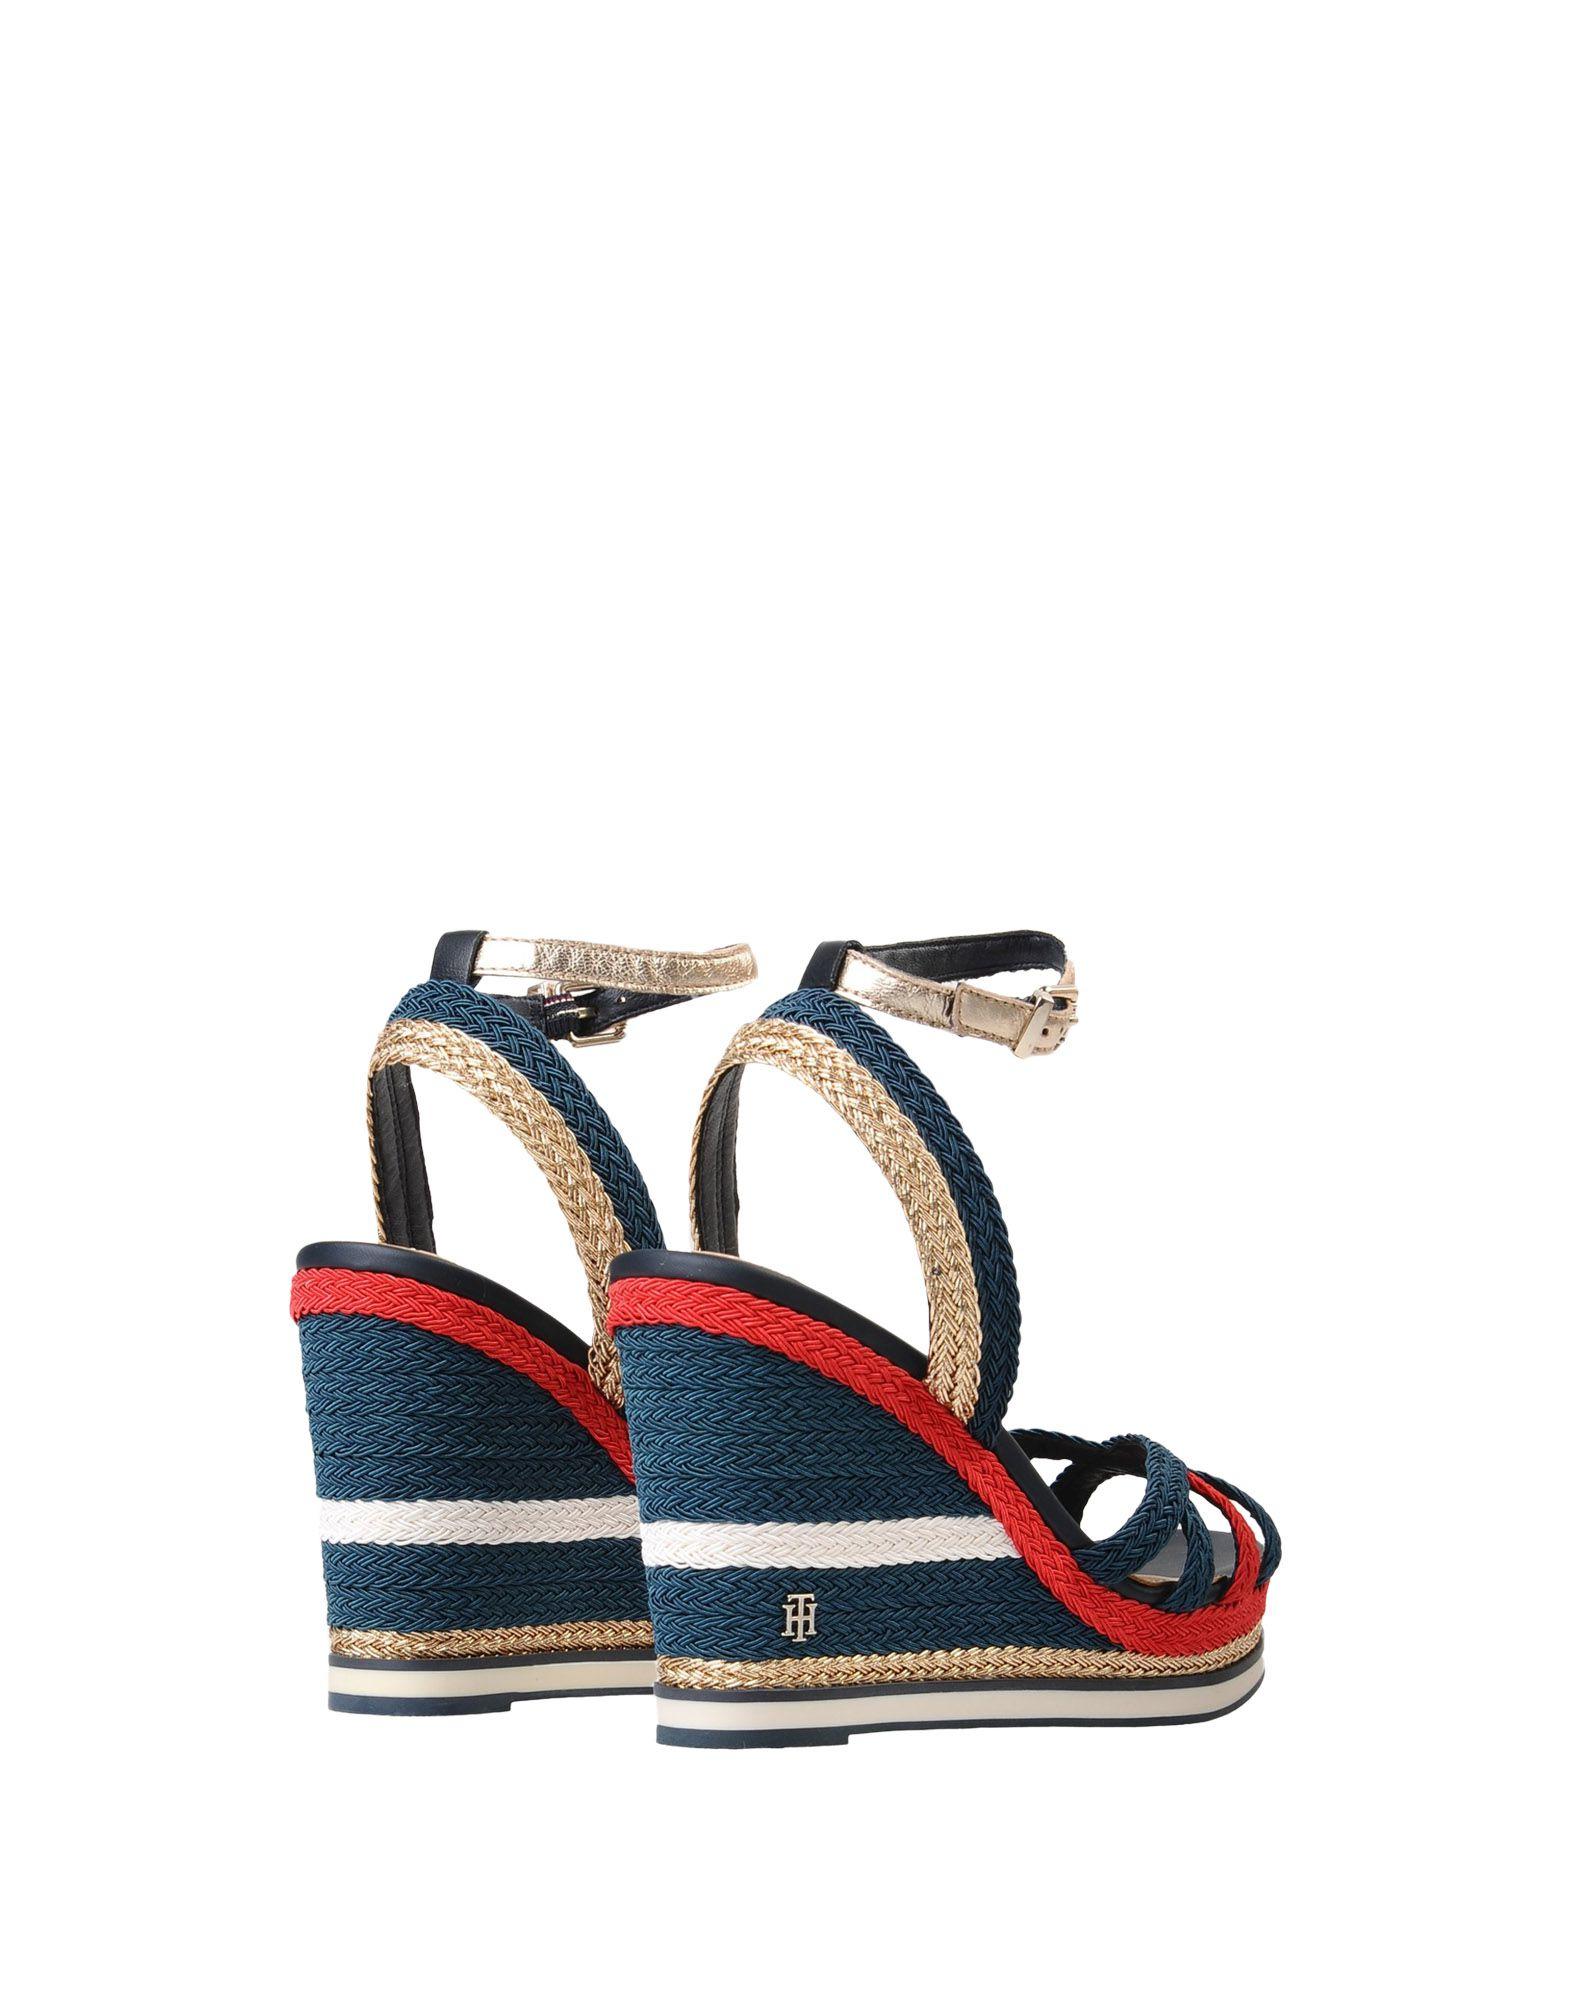 Sandales Tommy Hilfiger Corporate Wedge Sandal Sporty - Femme - Sandales Tommy Hilfiger sur